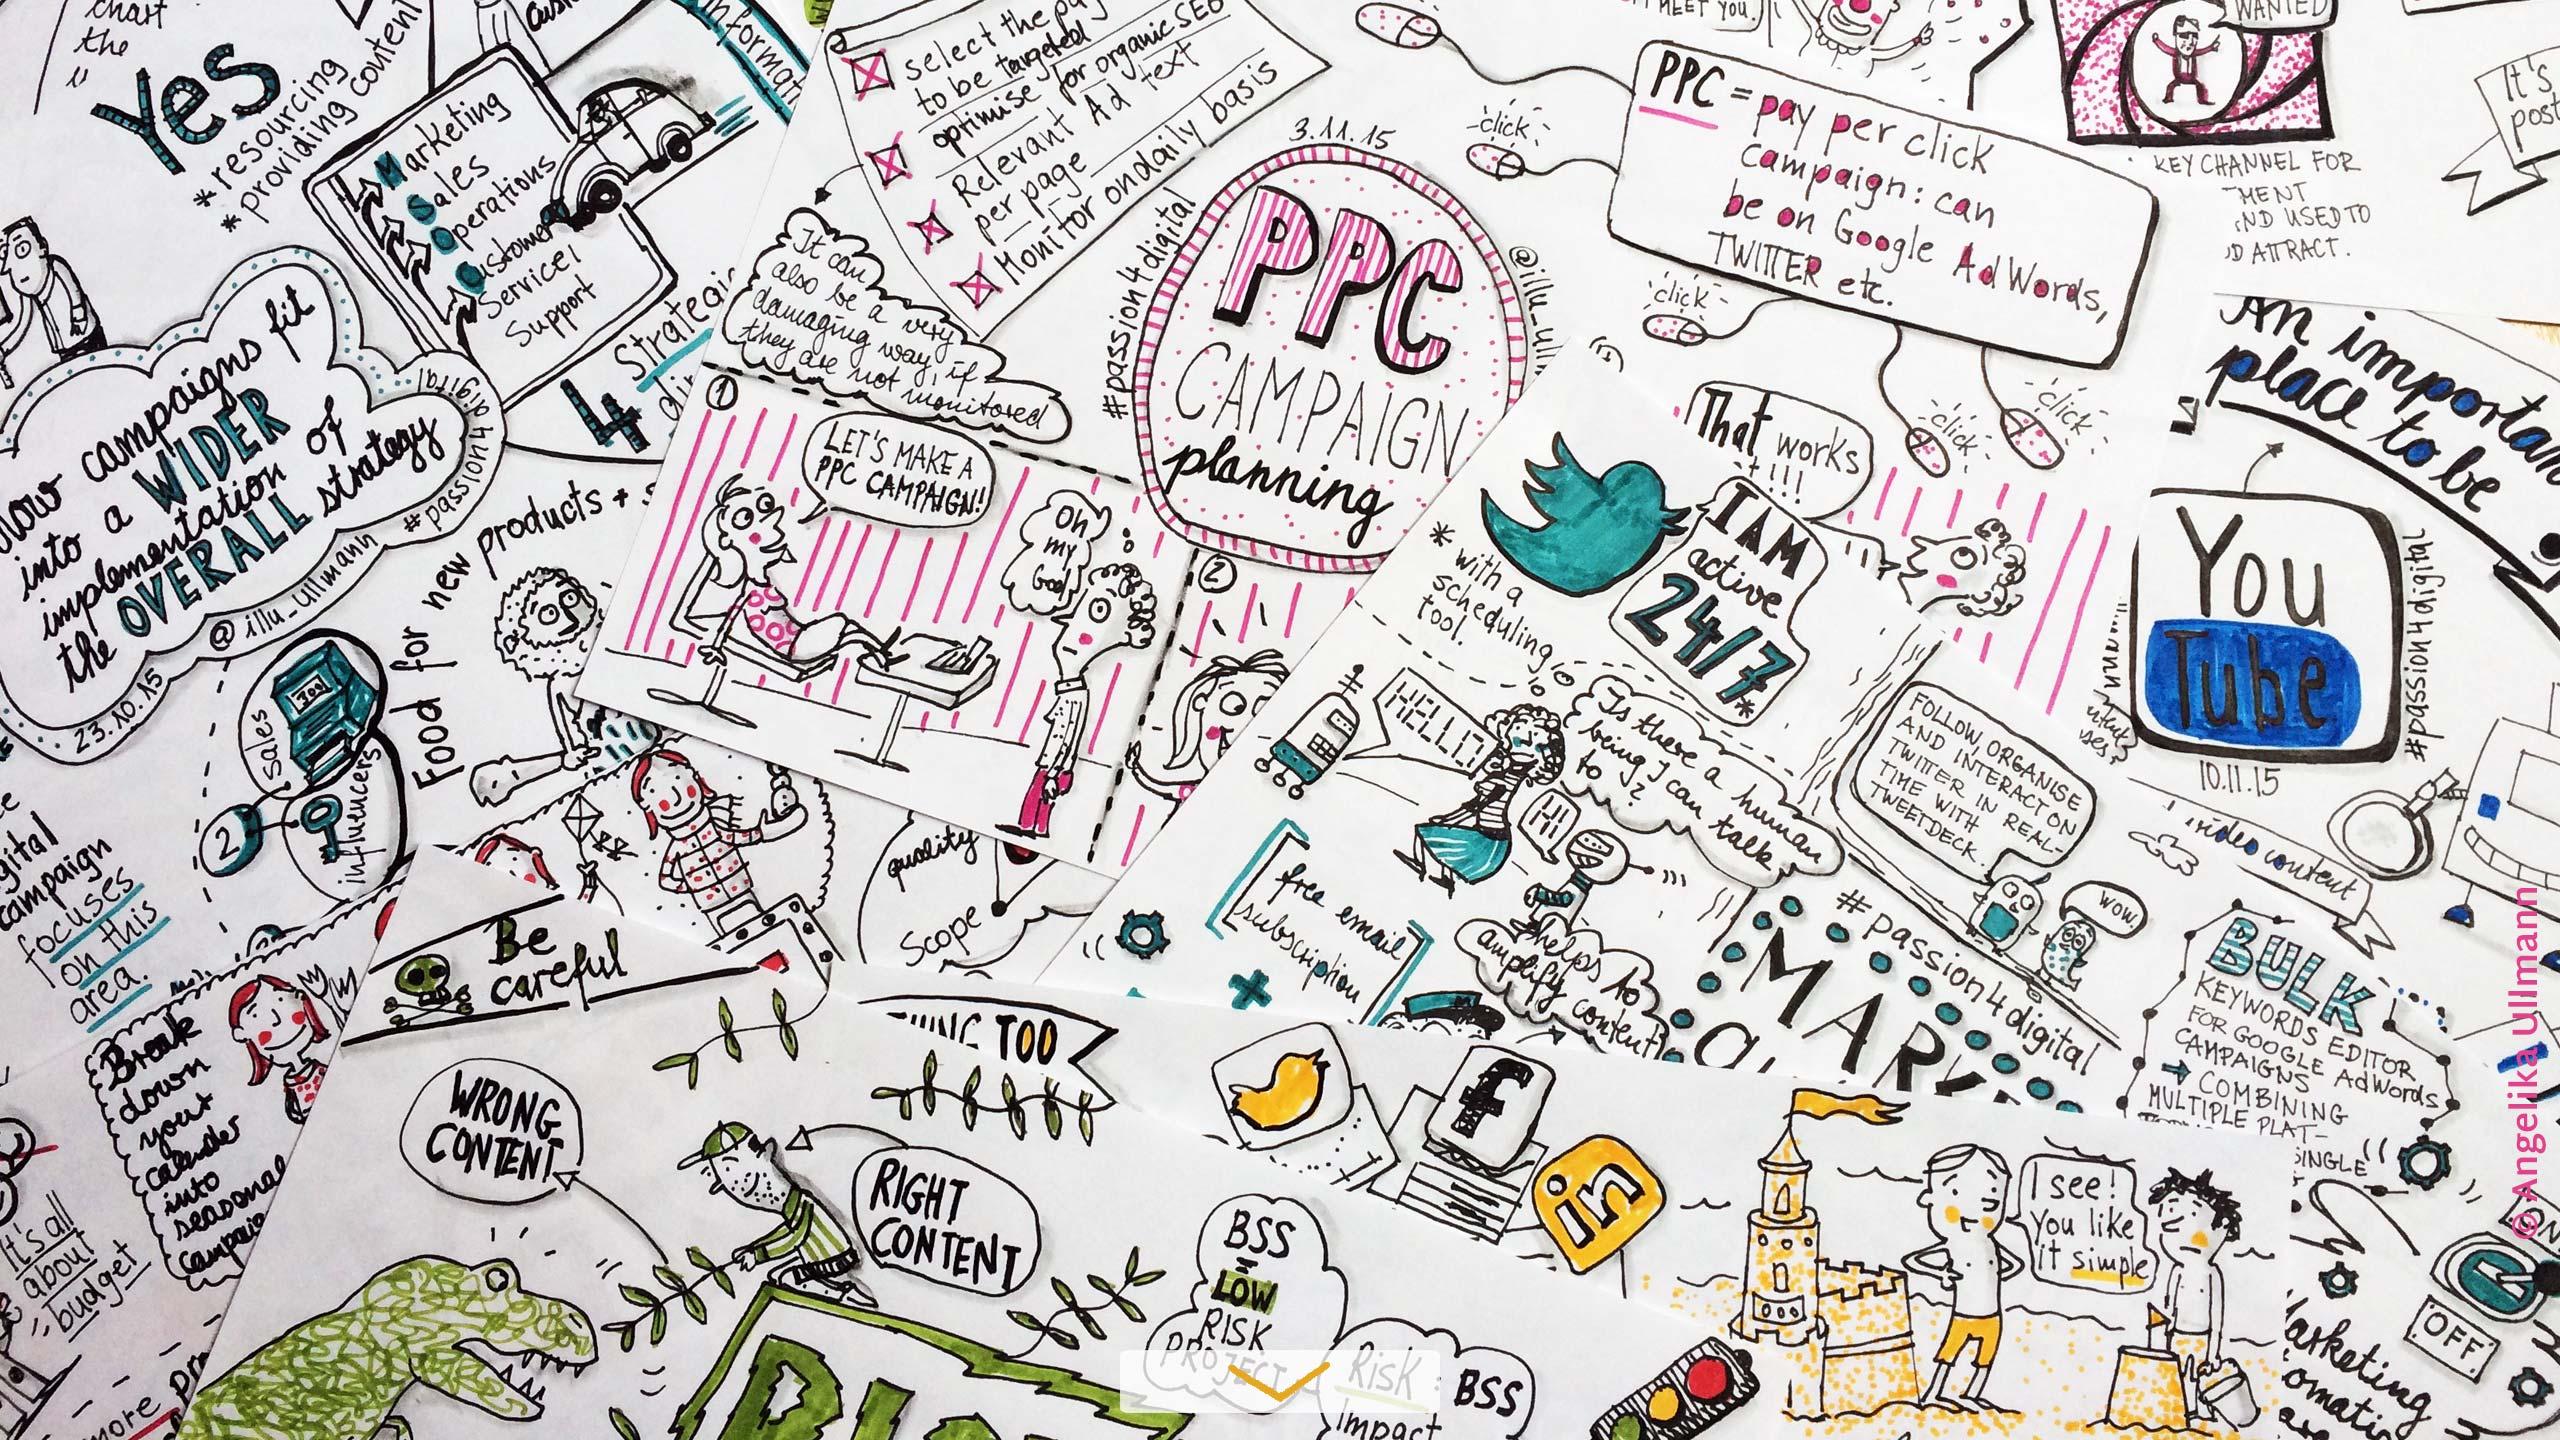 Sketchnotes Collage